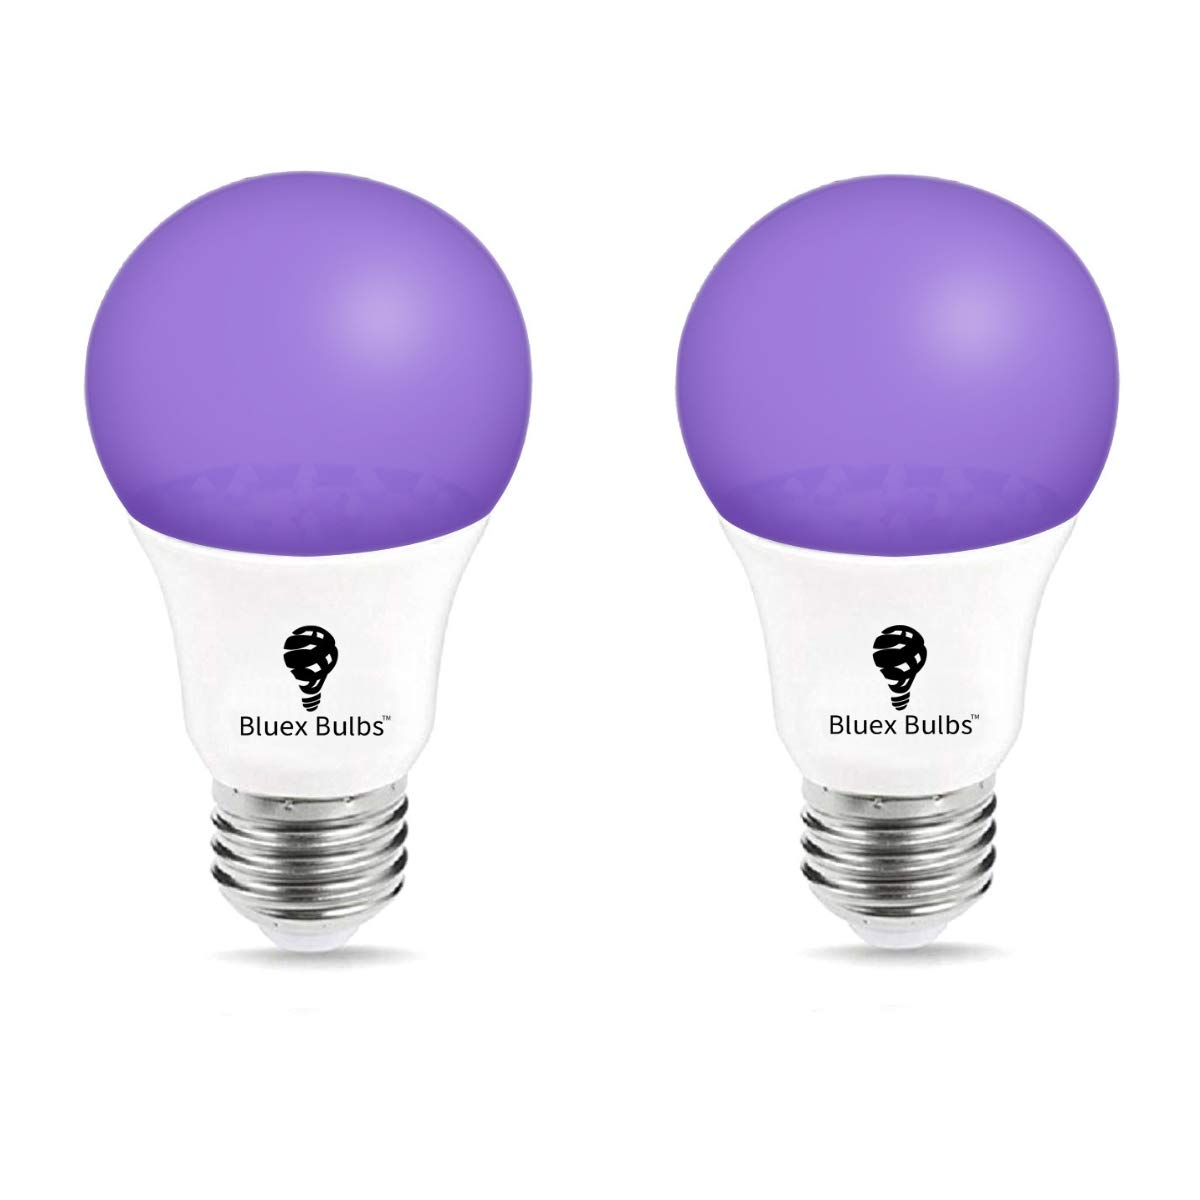 UV LED Black Light Bulb, 7W A19 E26 UV Blacklight Bulb UVA Level 385-400nm, LED Ultra Violet LED, Body Paint, Glow In The Dark Party LED Light Bulb Neon Glow Fluorescent Poster by Bluex Bulbs (2 Pack)